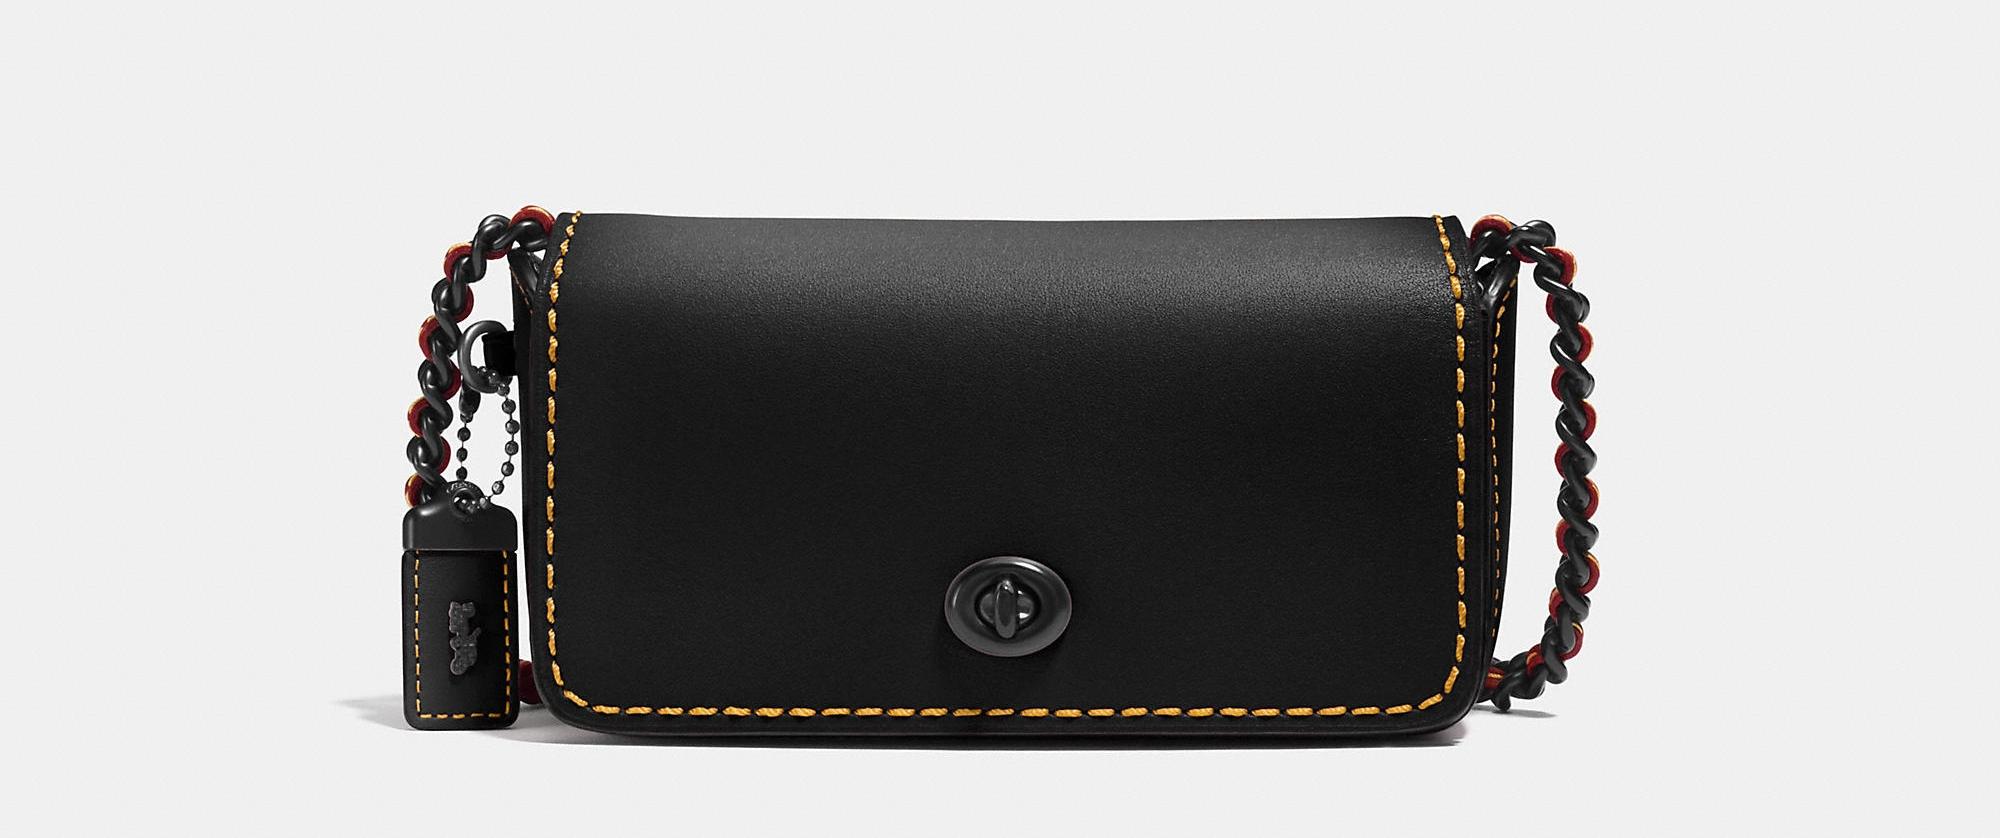 COACH DINKIER BLACK BAG